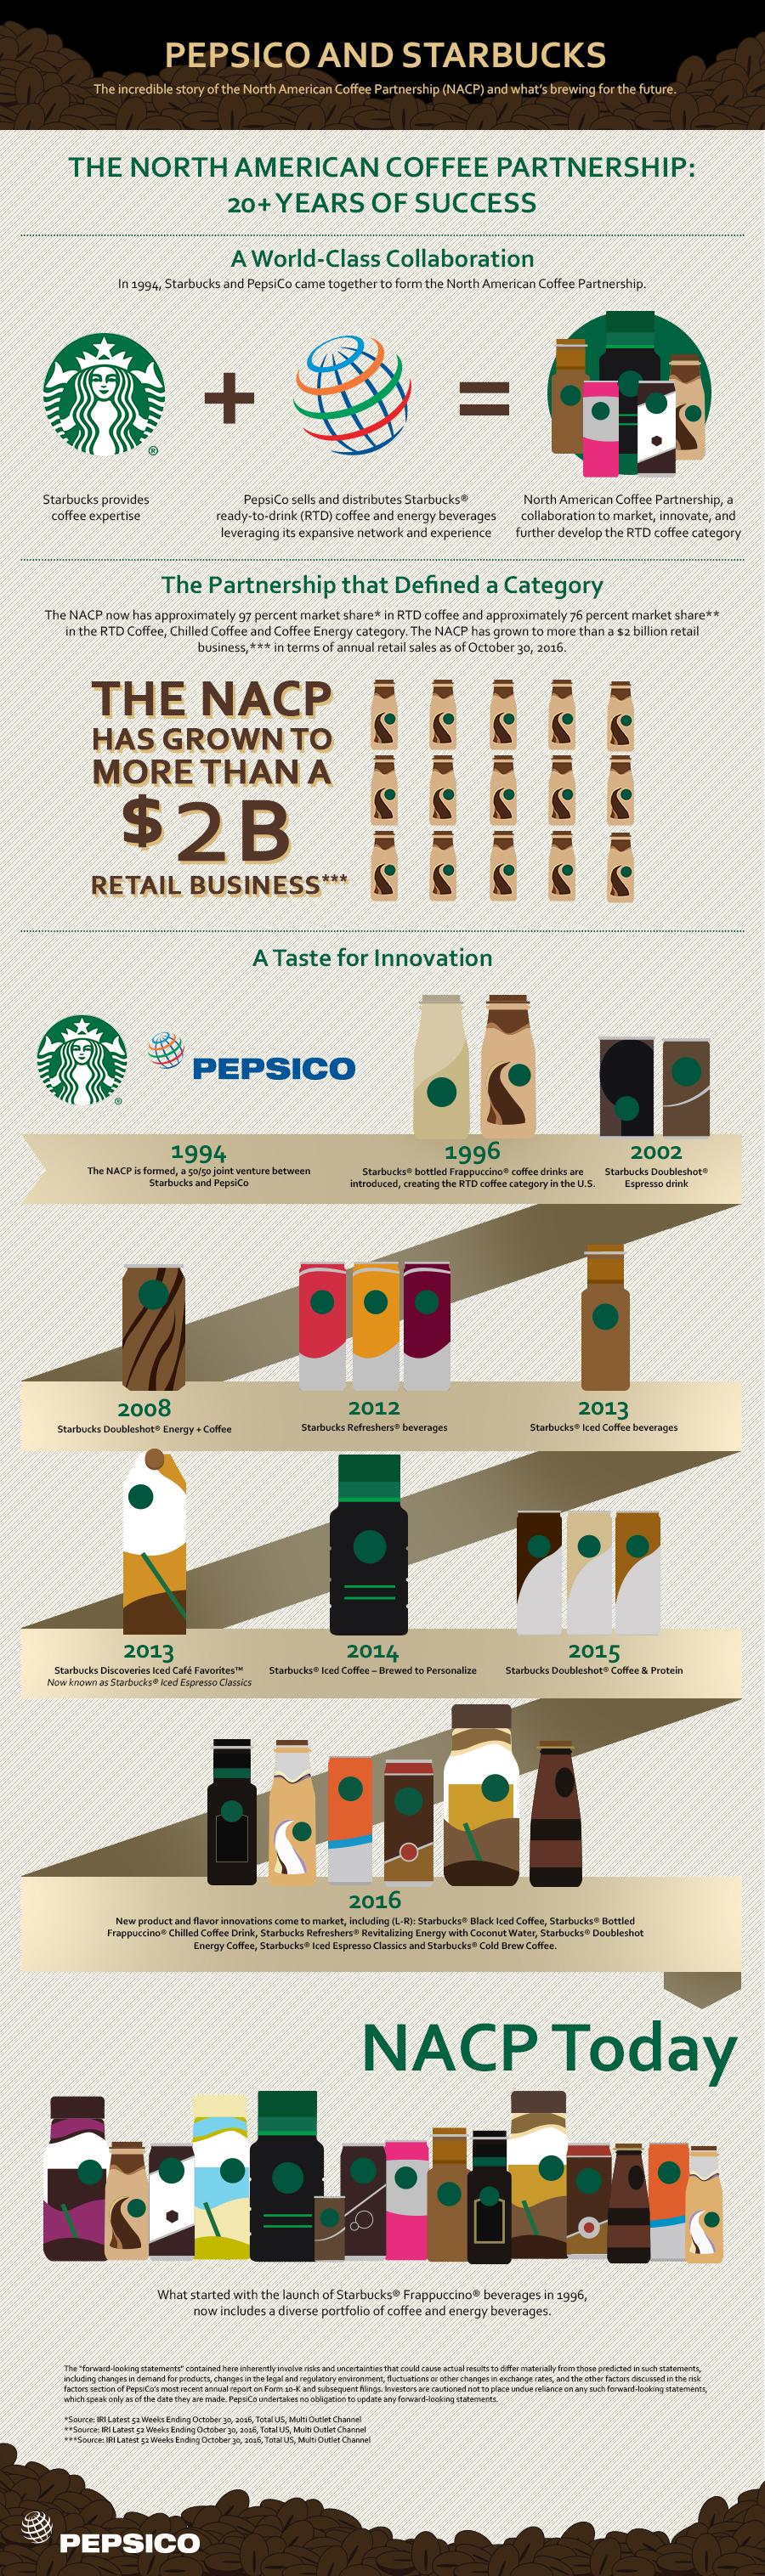 Fact Sheet: Starbucks and PepsiCo Partnership - Starbucks Stories